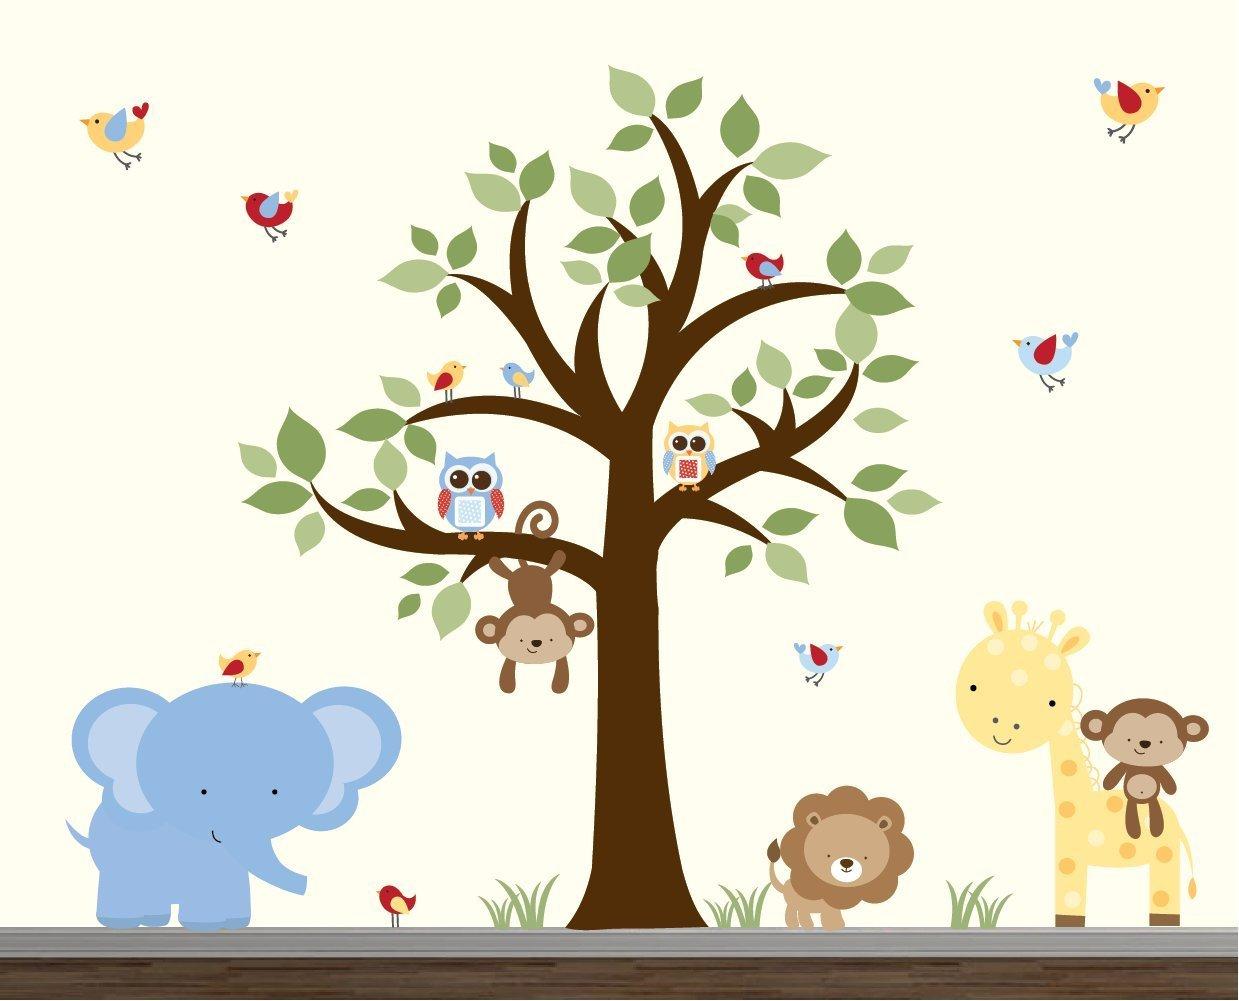 Jungle Wall Stickers-Jungle Wall Decal-Jungle Animal Decals-Wall Stickers-Nursery Wall Decor-Nursery Wall Decals-Elephant Wall Decals Art